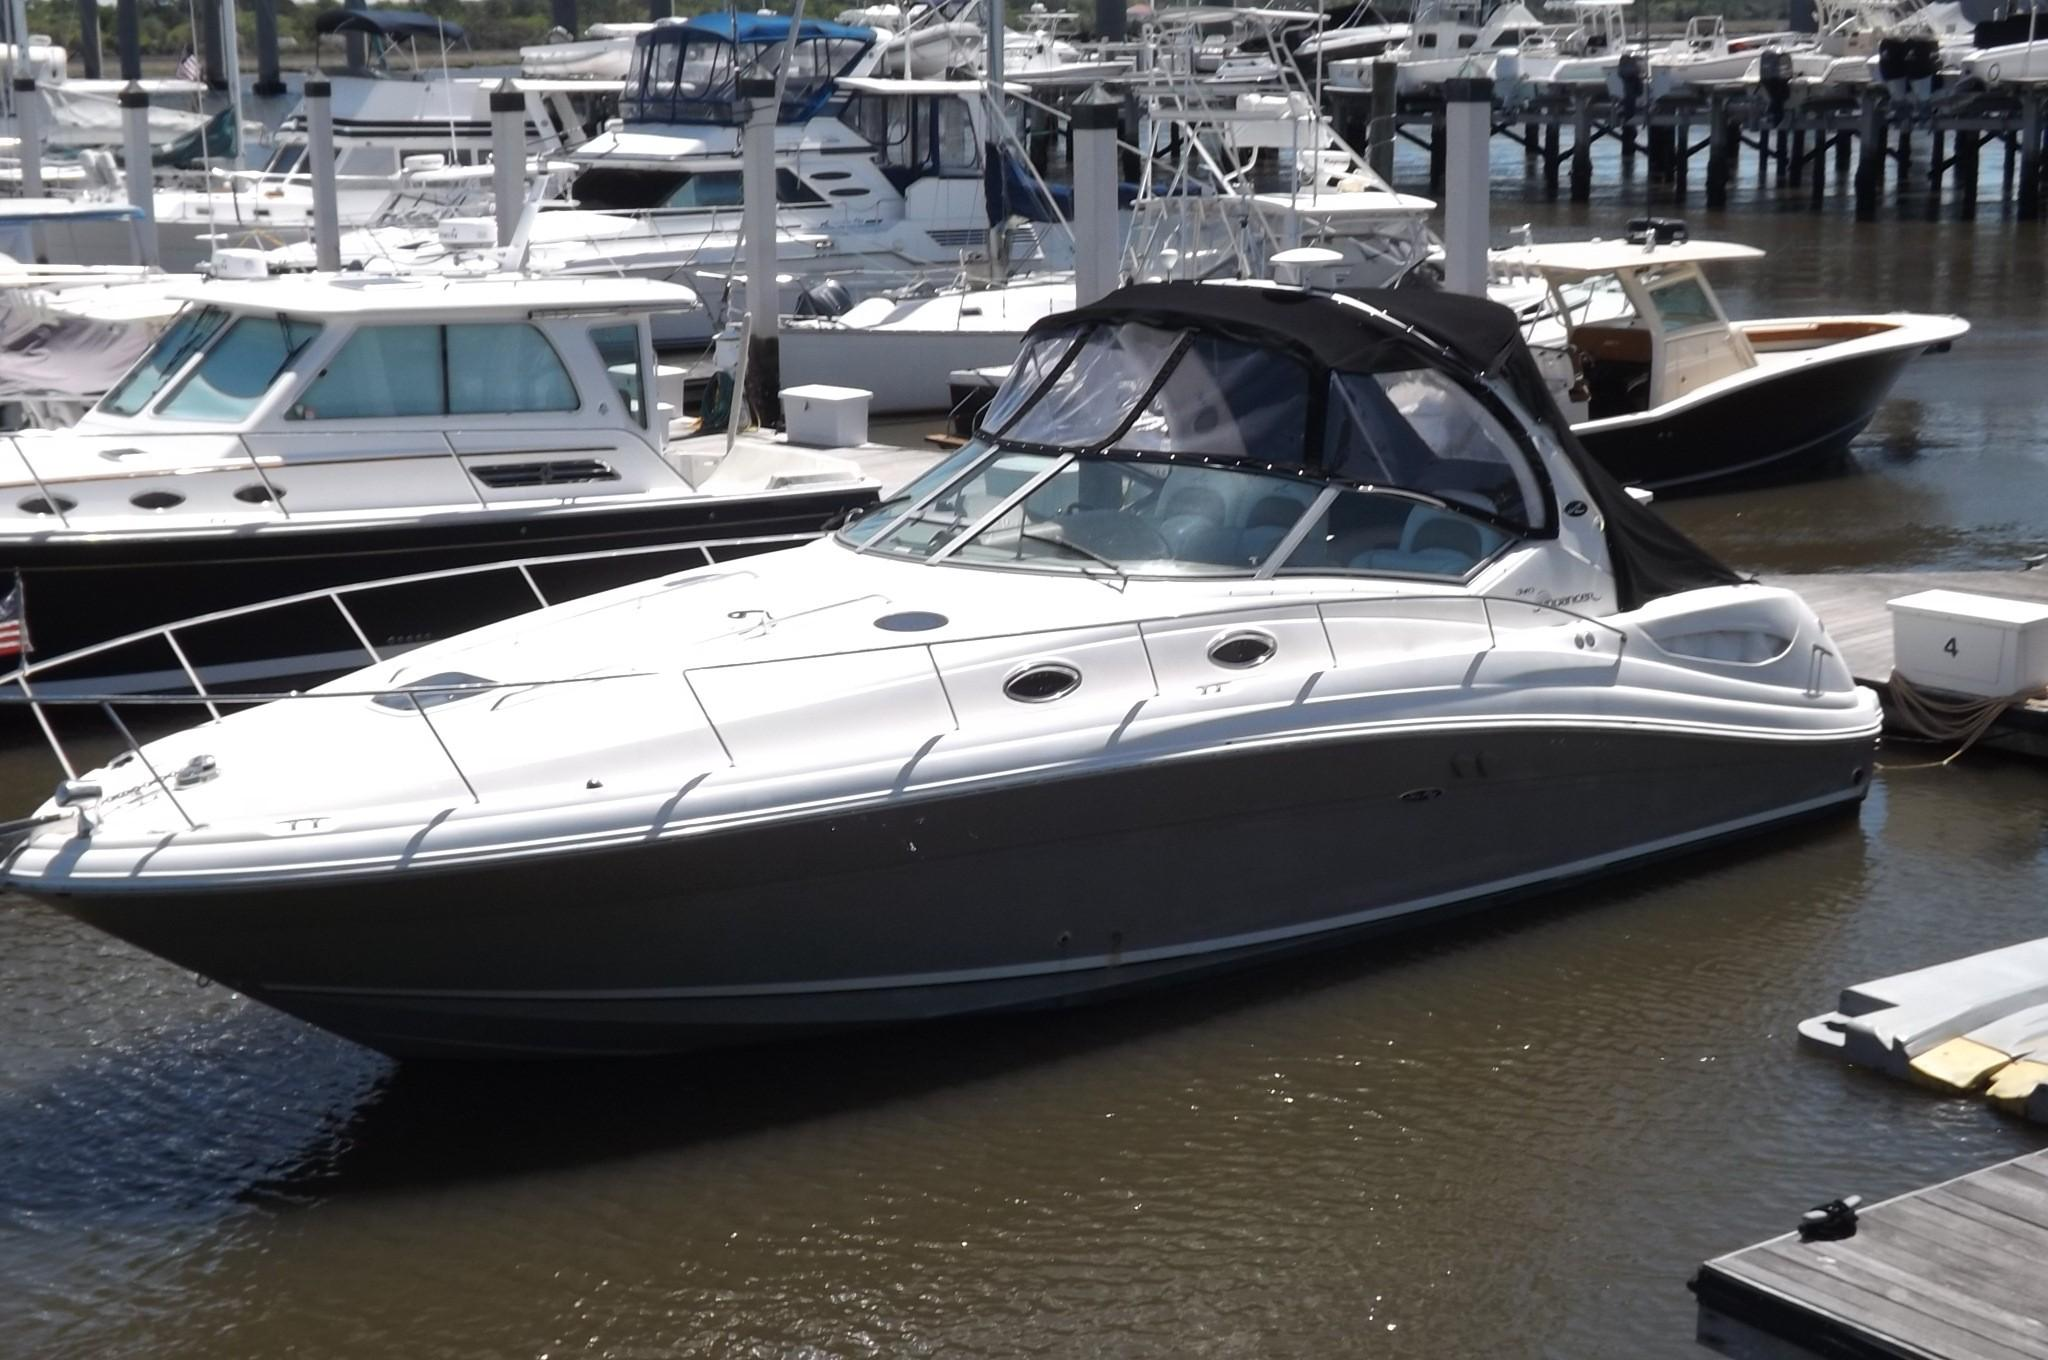 1997 sea ray 400 sedan bridge power boat for sale www yachtworld com2007 sea ray 340 [ 2048 x 1360 Pixel ]